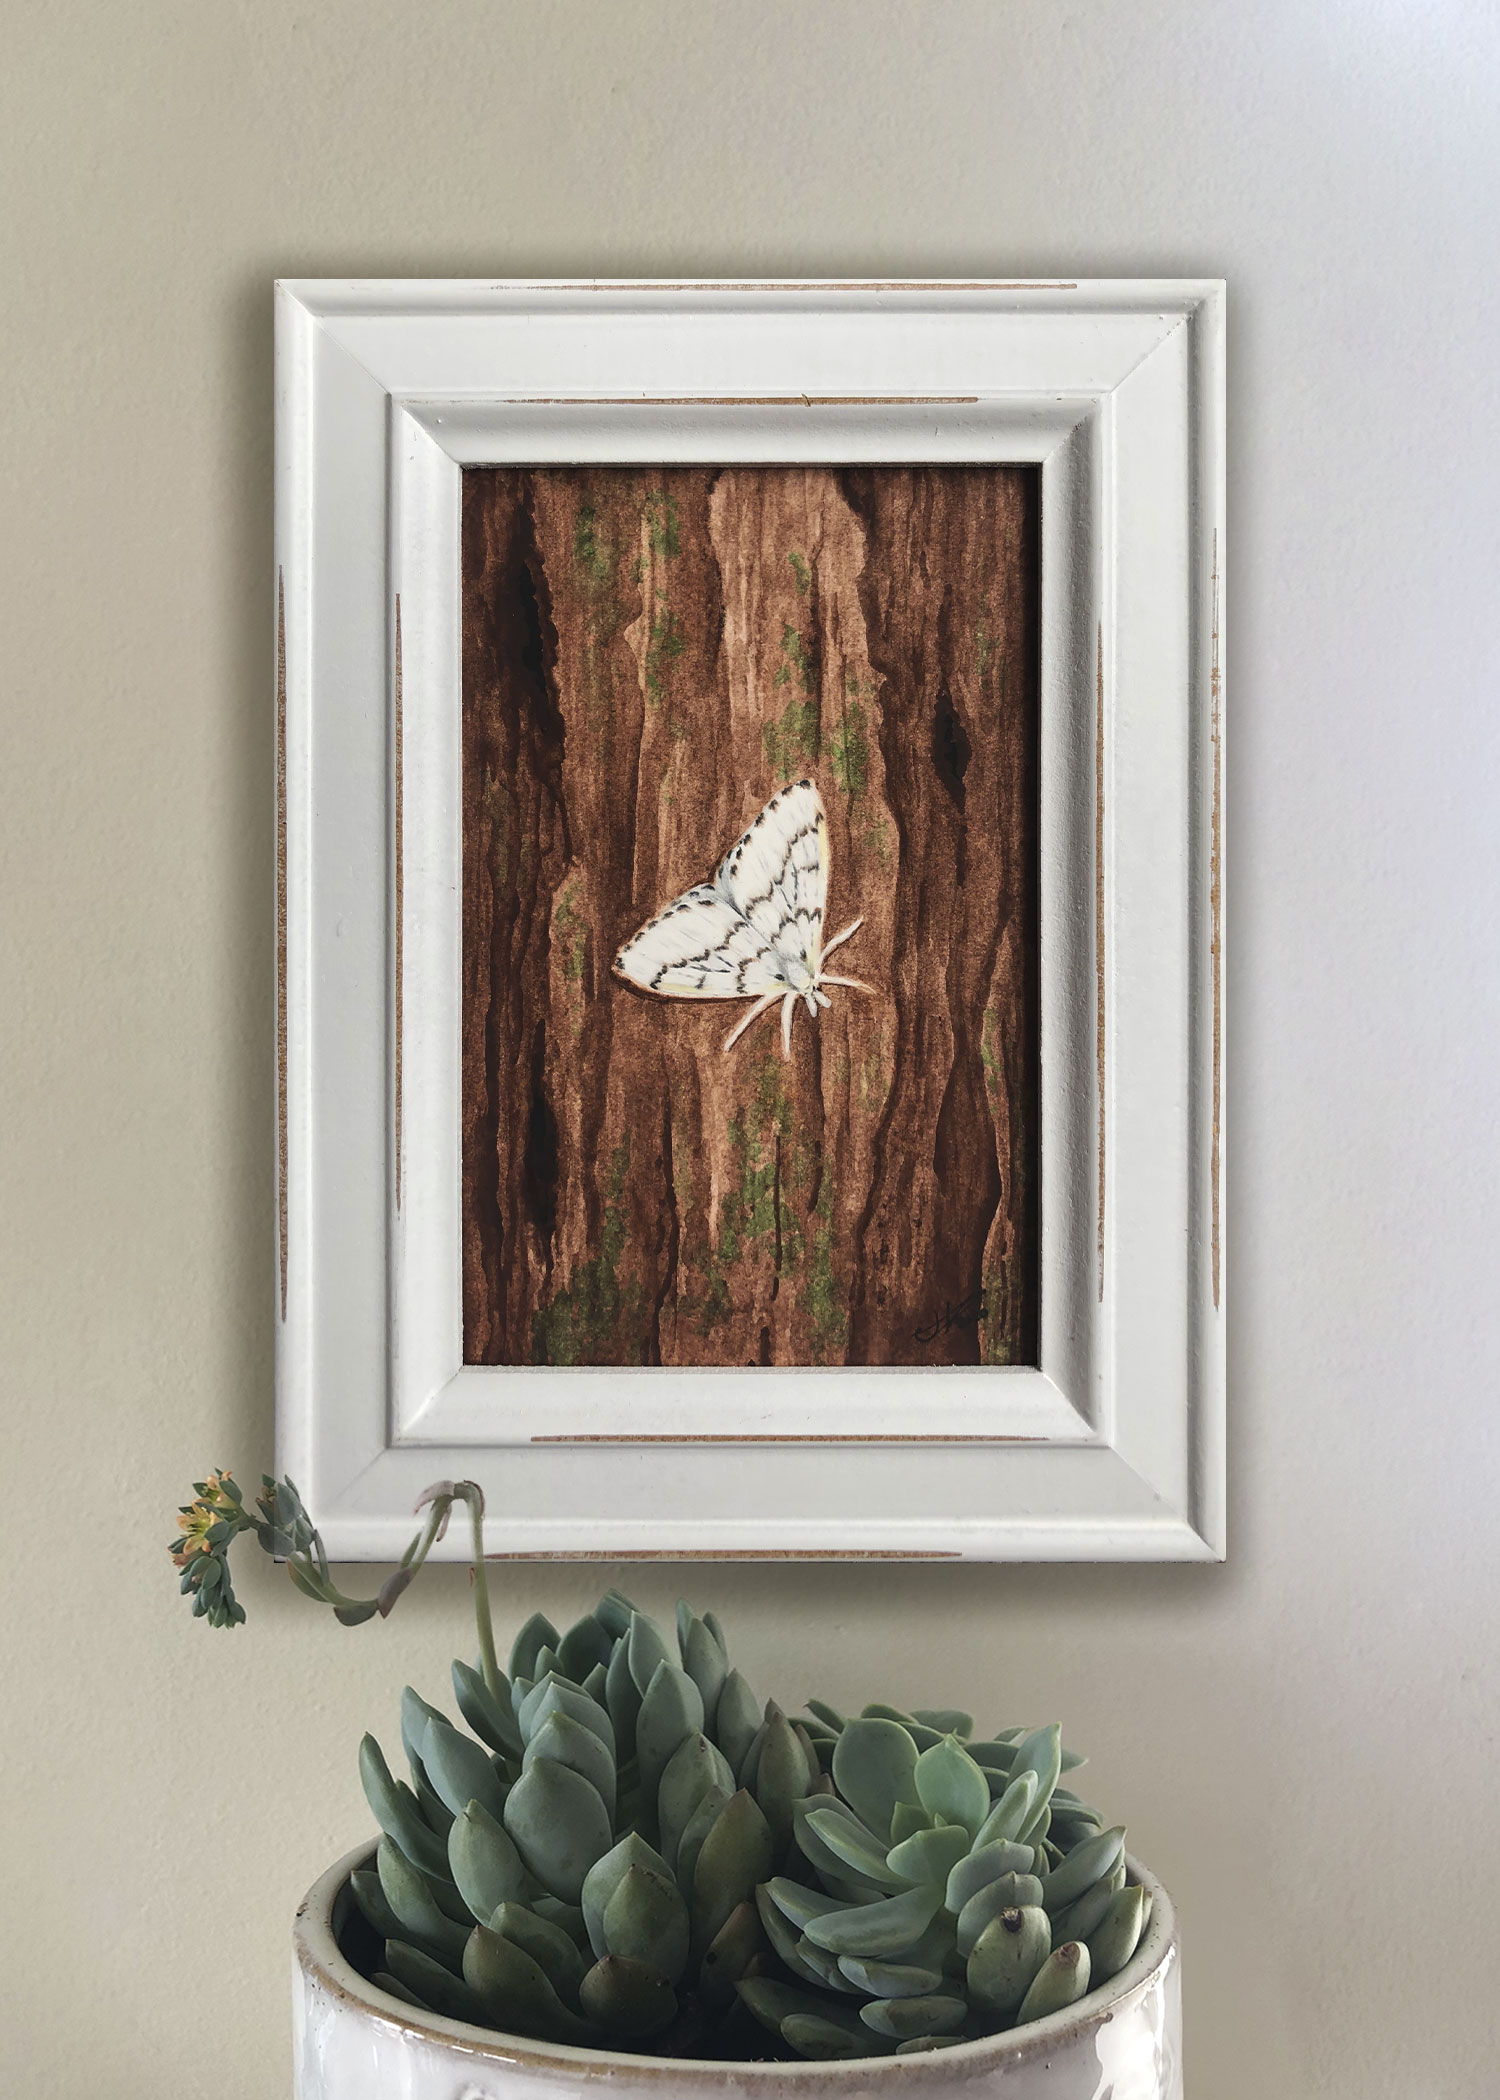 Phantom Hemlock Looper Moth in Frame